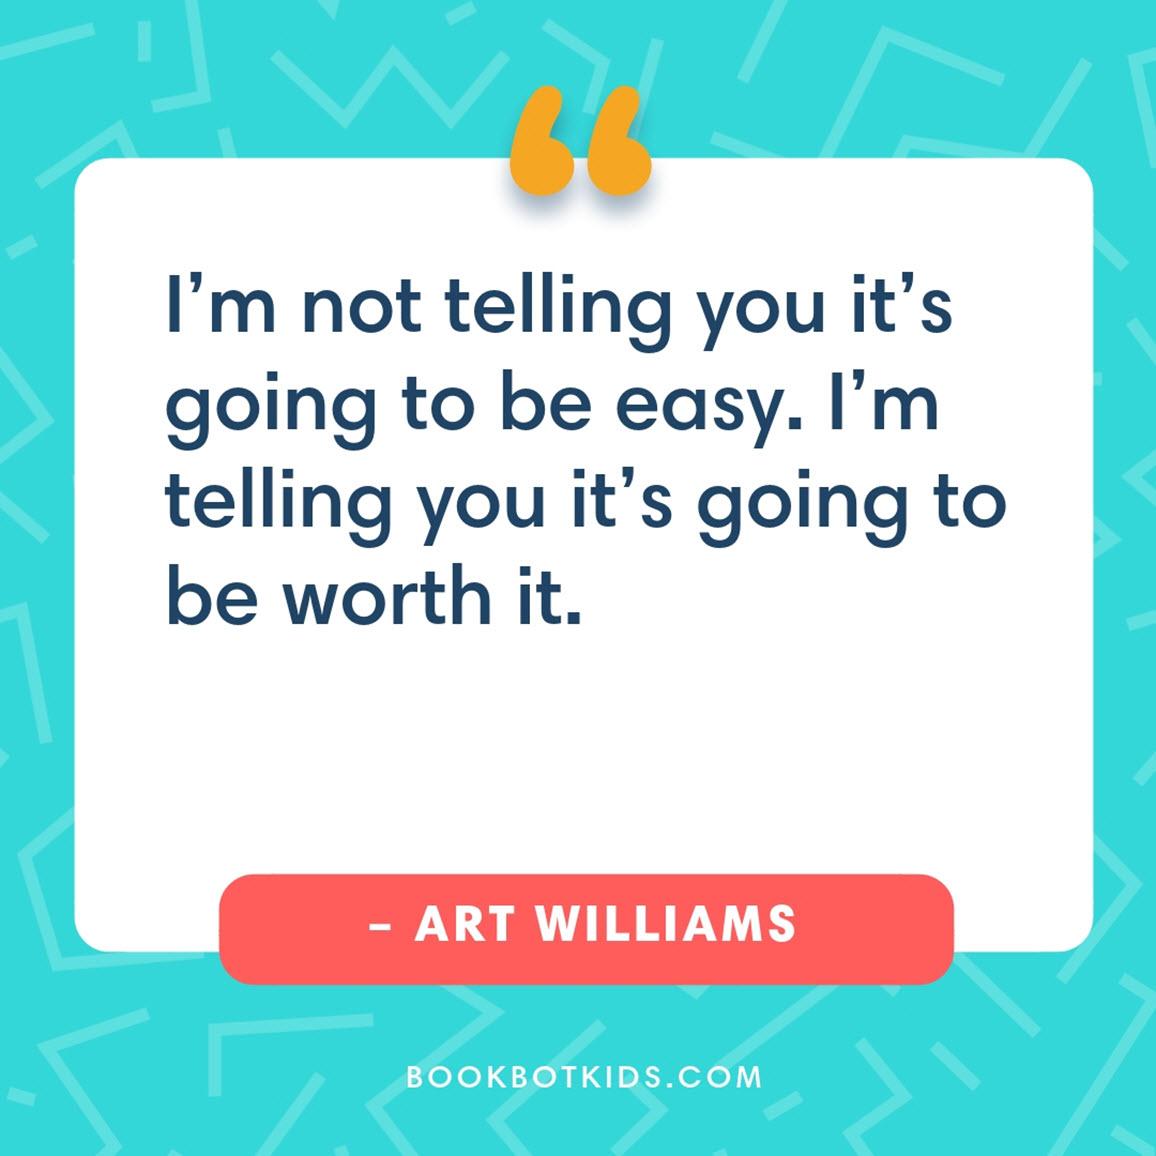 I'm not telling you it's going to be easy. I'm telling you it's going to be worth it. – Art Williams